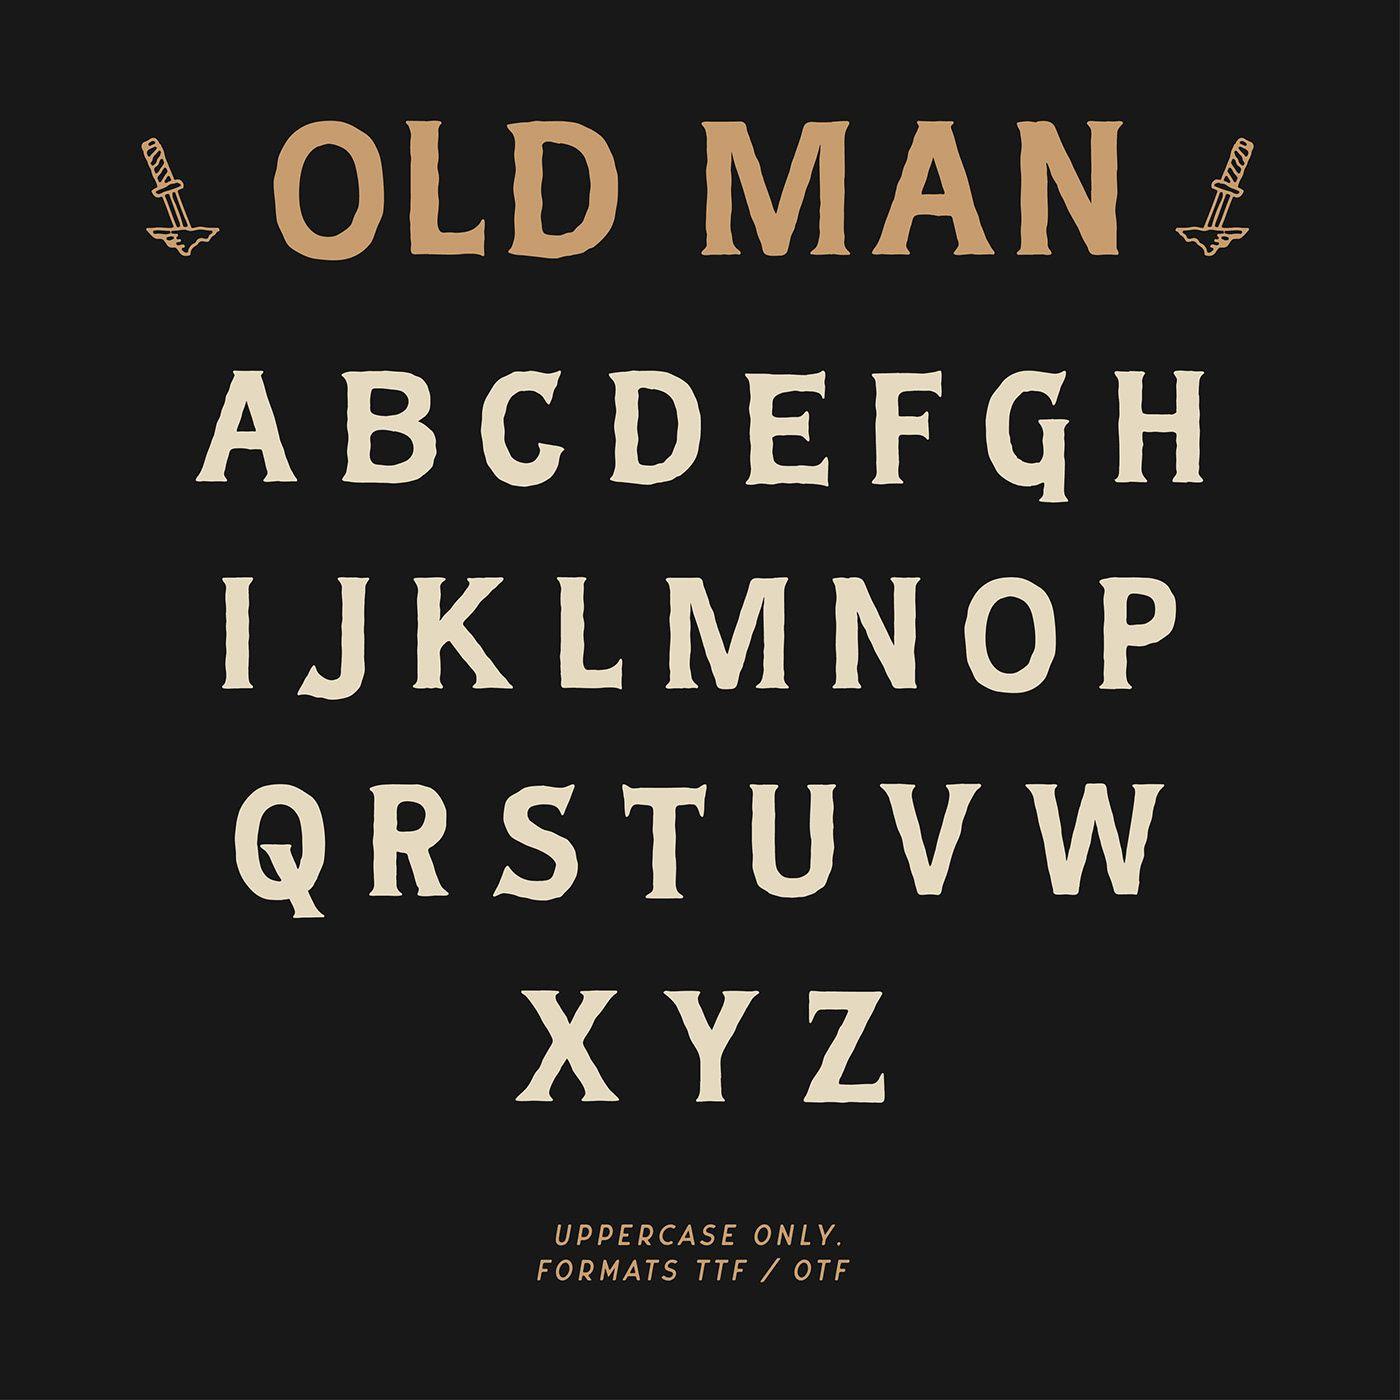 Old Man Typeface In 2020 Word Fonts Lettering Fonts Vintage Fonts Free